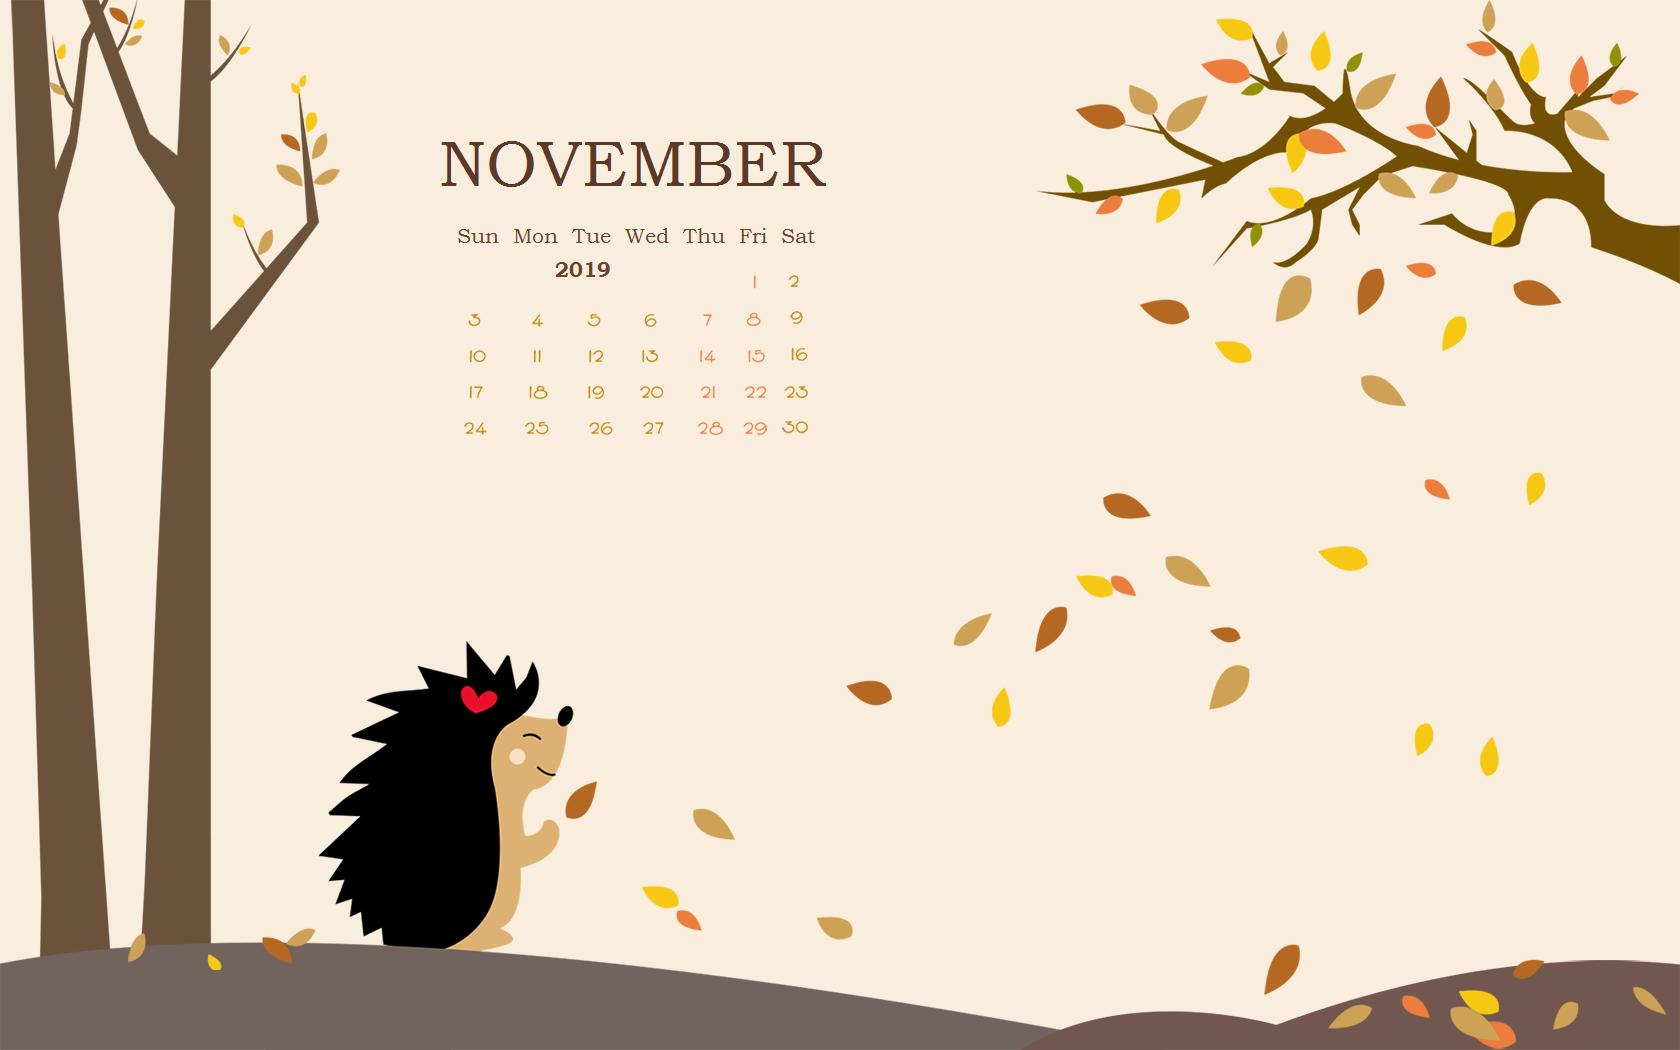 November 2019 HD Calendar Wallpaper